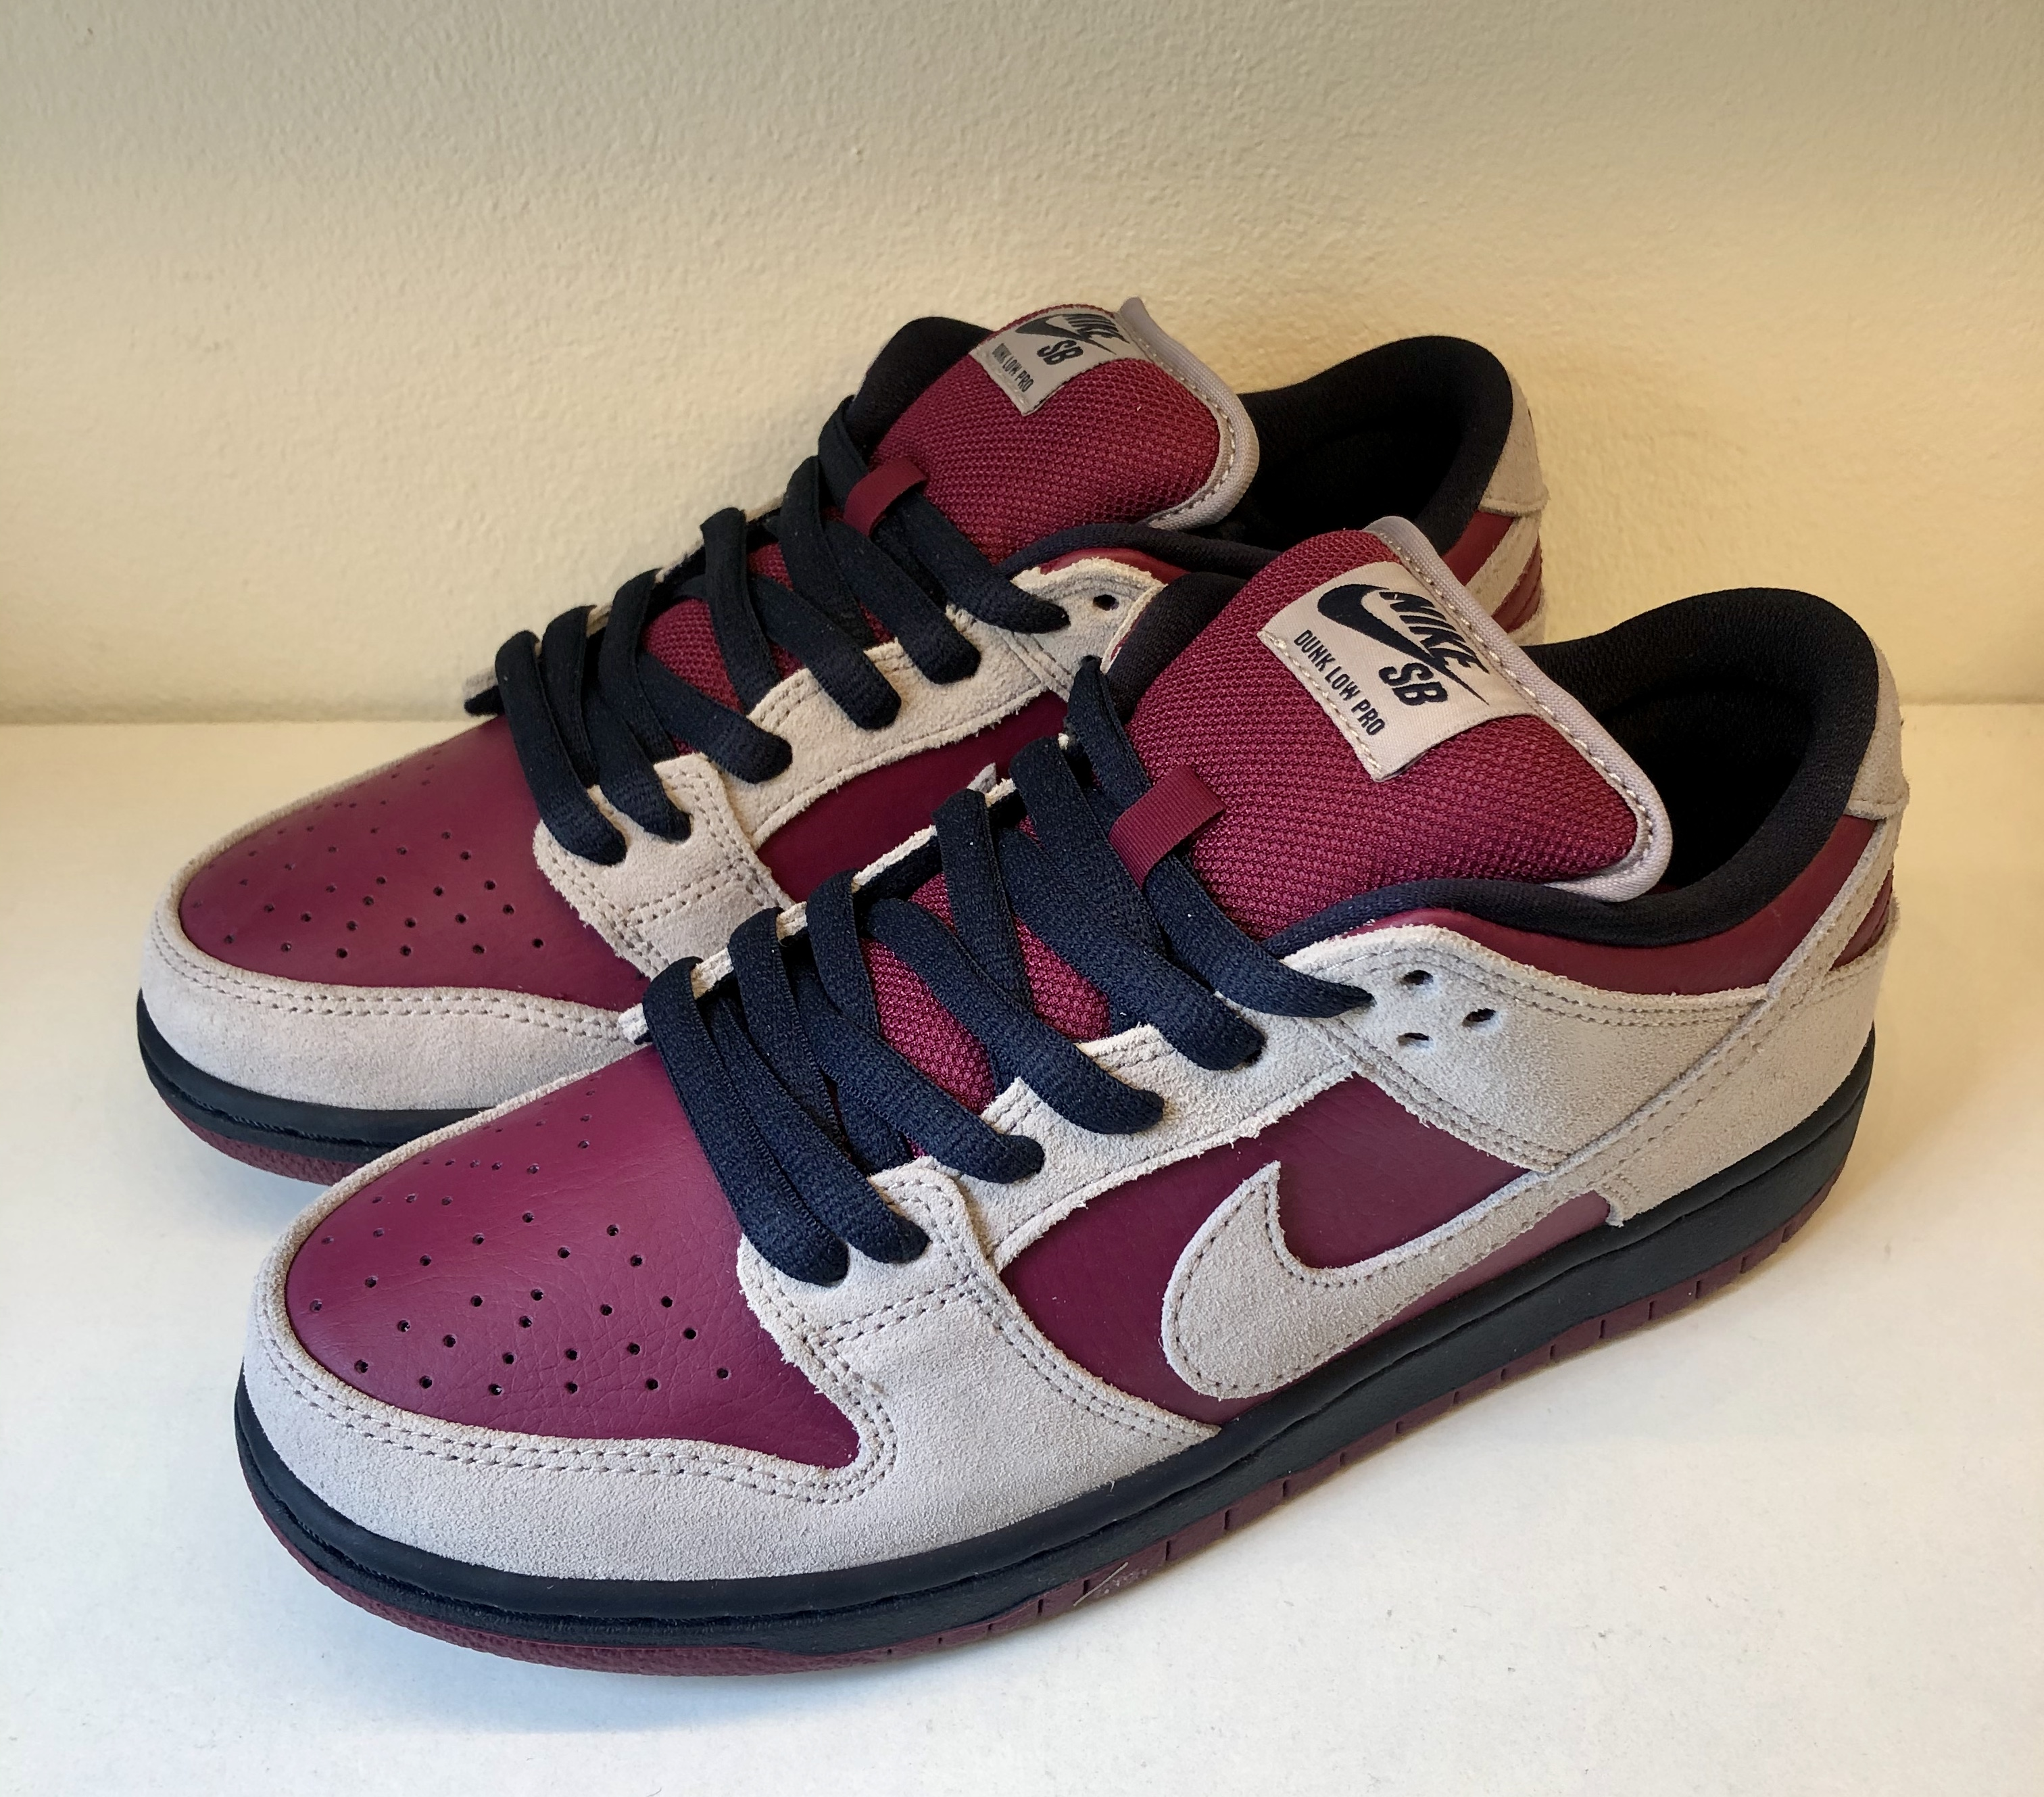 Nike SB Dunk Low Atmosphere Grey True Berry